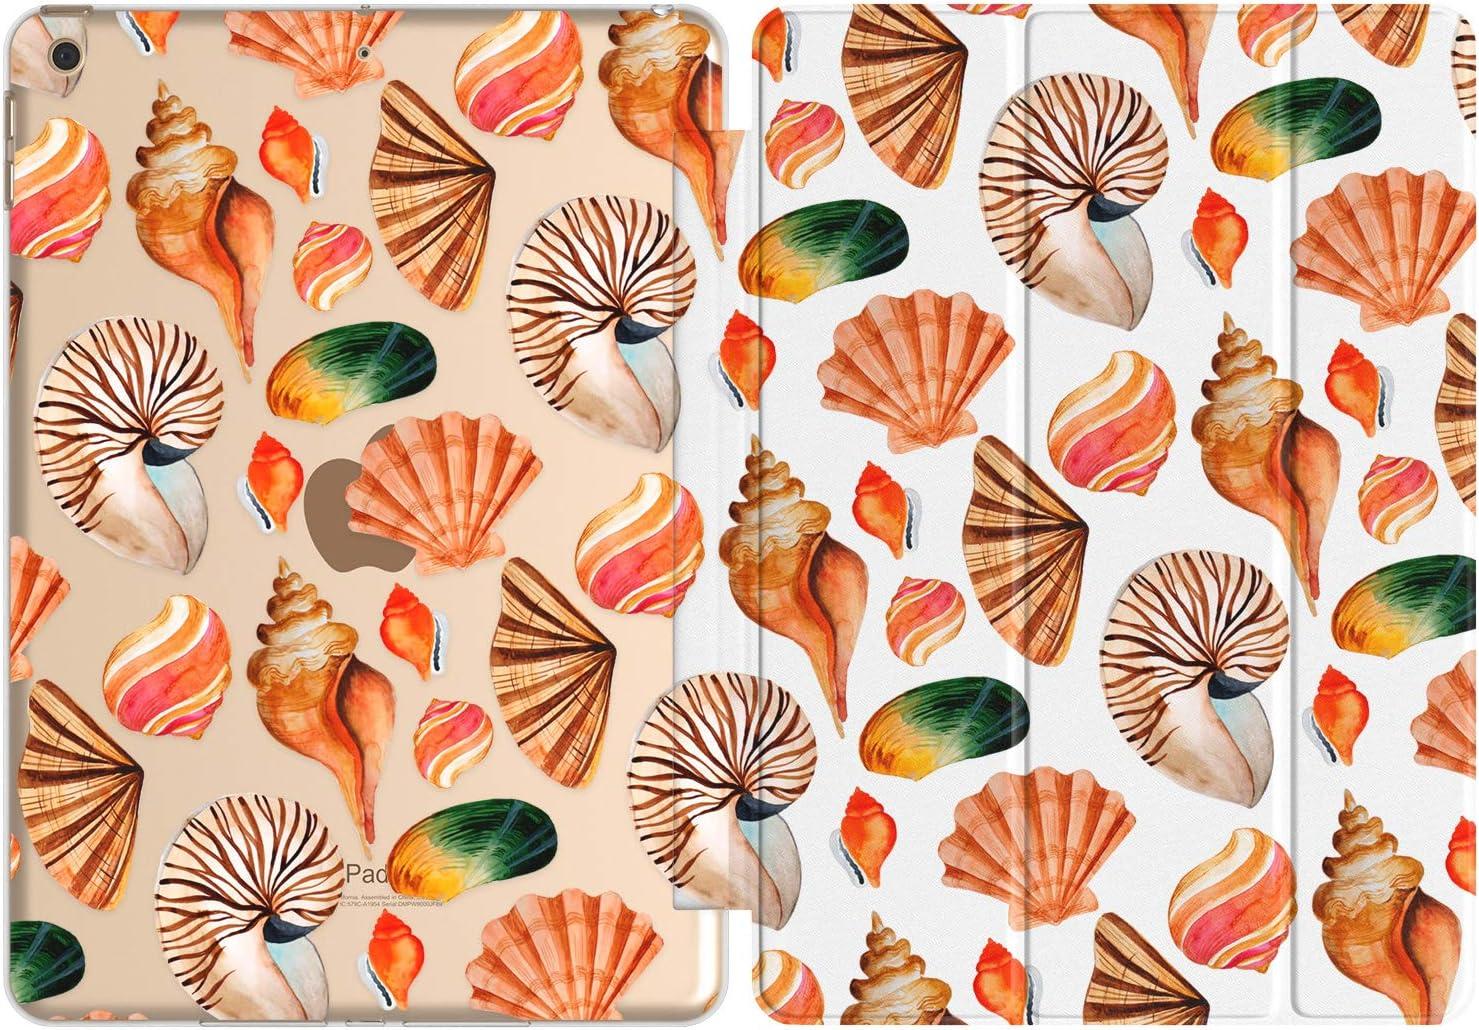 Vonna Case Replacement for Apple iPad Air 4th Gen 2020 12.9 Pro 10.2 8th 11 10.5 9.7 Mini 5/4/3/2/1 Funny Ocean Shore Cute Slim Stand Beach Design Closure Print Fish Magnetic Pattern Seashell vm296